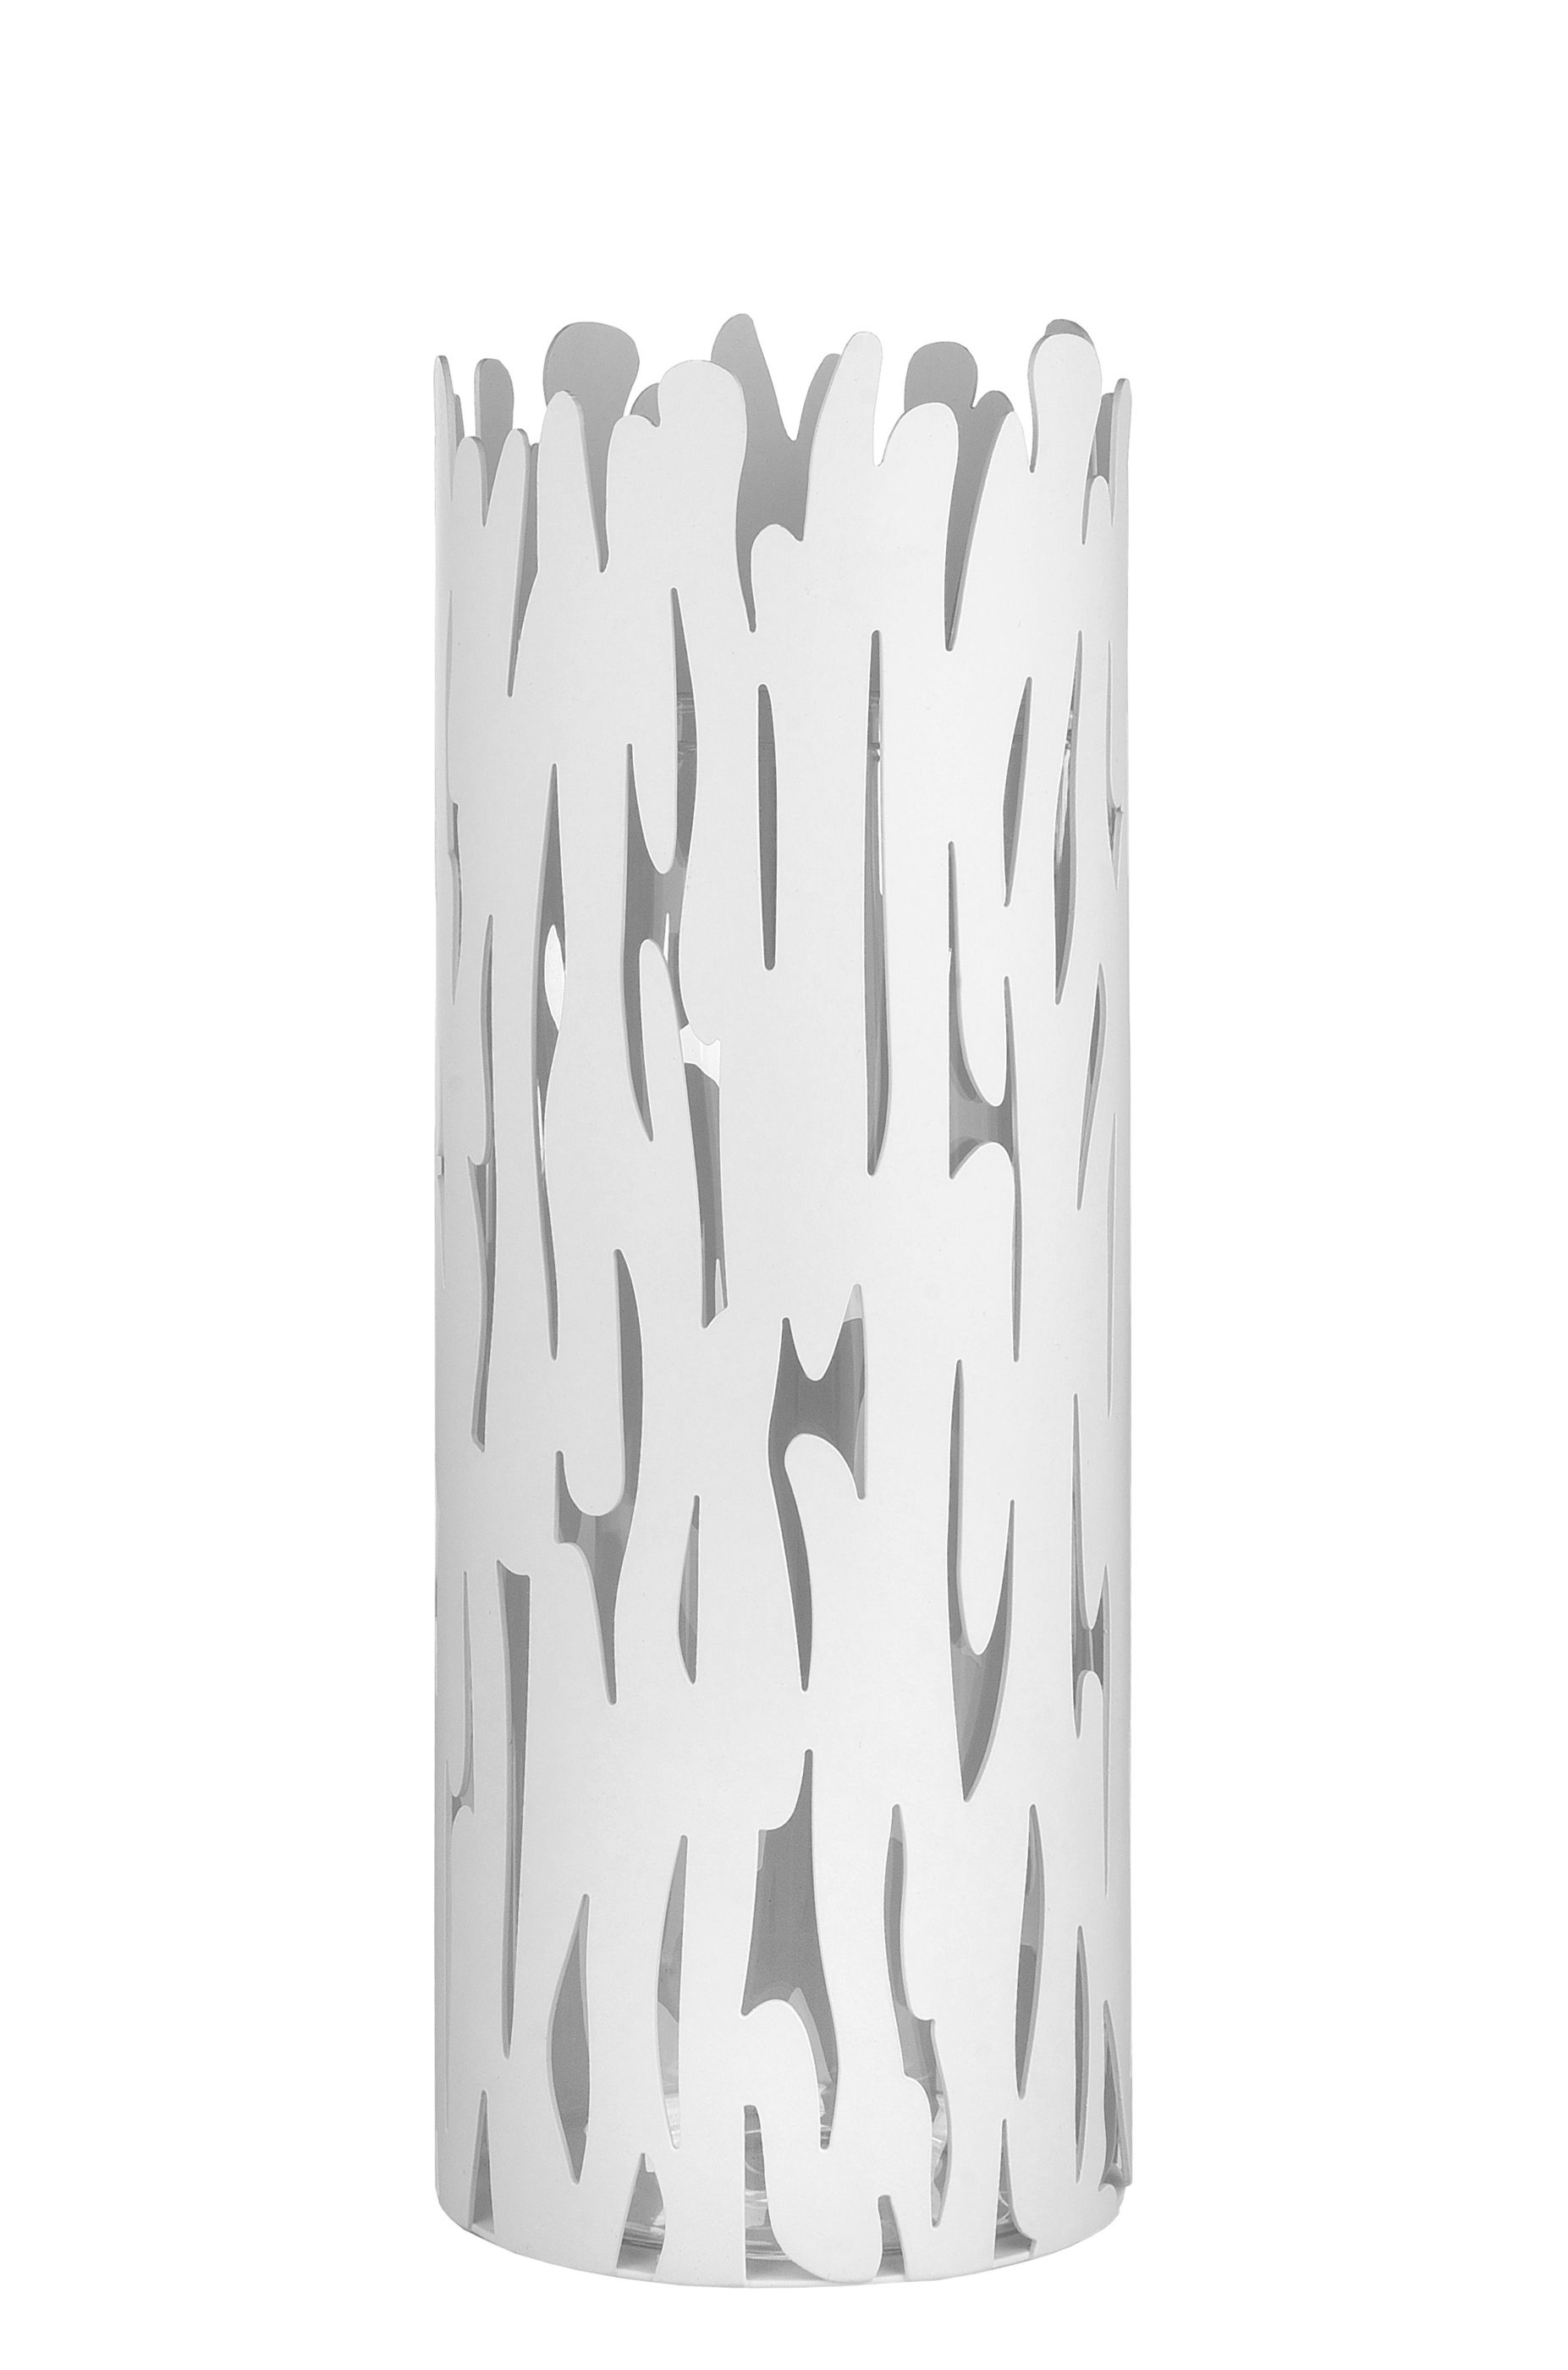 Decoration - Vases - Barkvase Vase by Alessi - White - Glass, Lacquered stainless steel